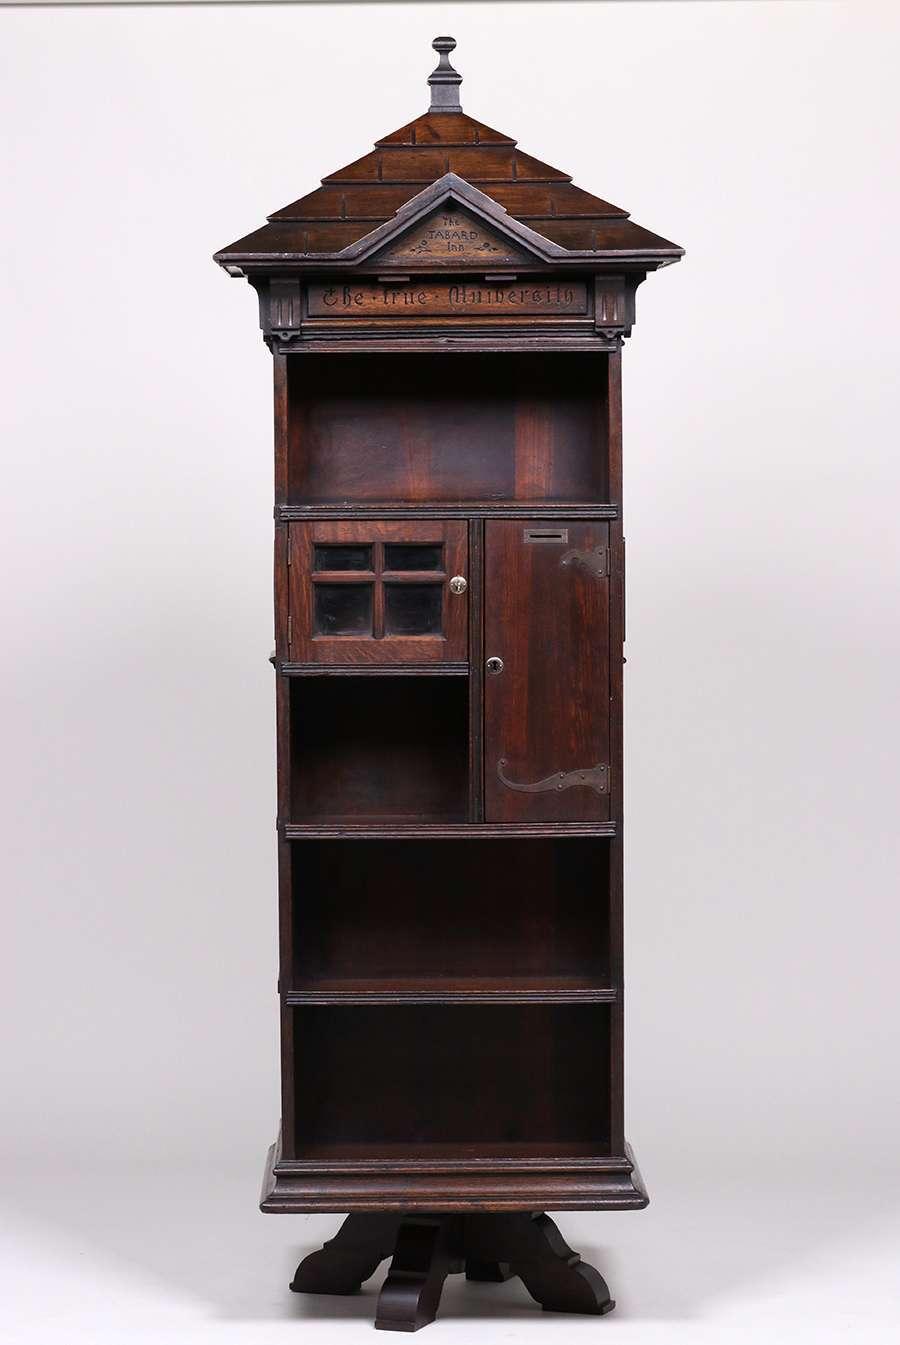 Seymour Easton 1859 1916 Tabard Inn Library Revolving Bookcase C1902 California Historical